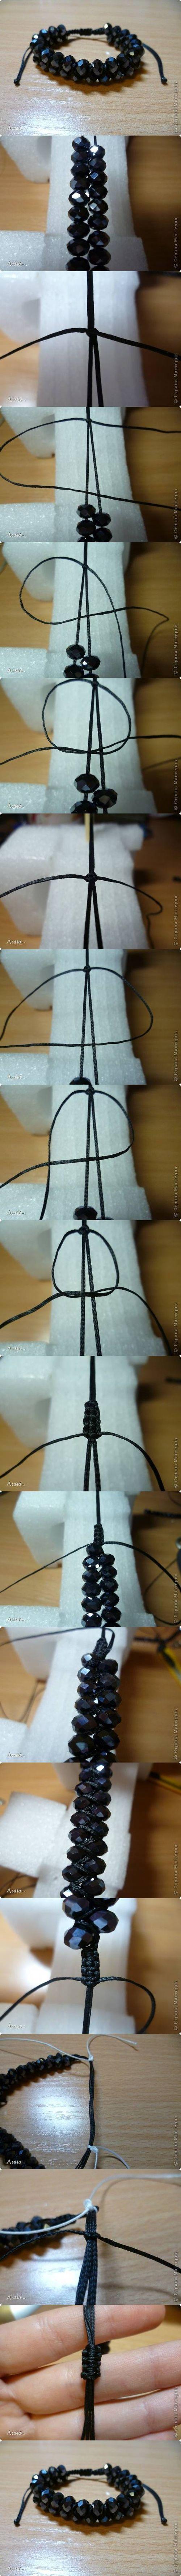 DIY Dual Shambhala Bracelet DIY Projects / UsefulDIY.com